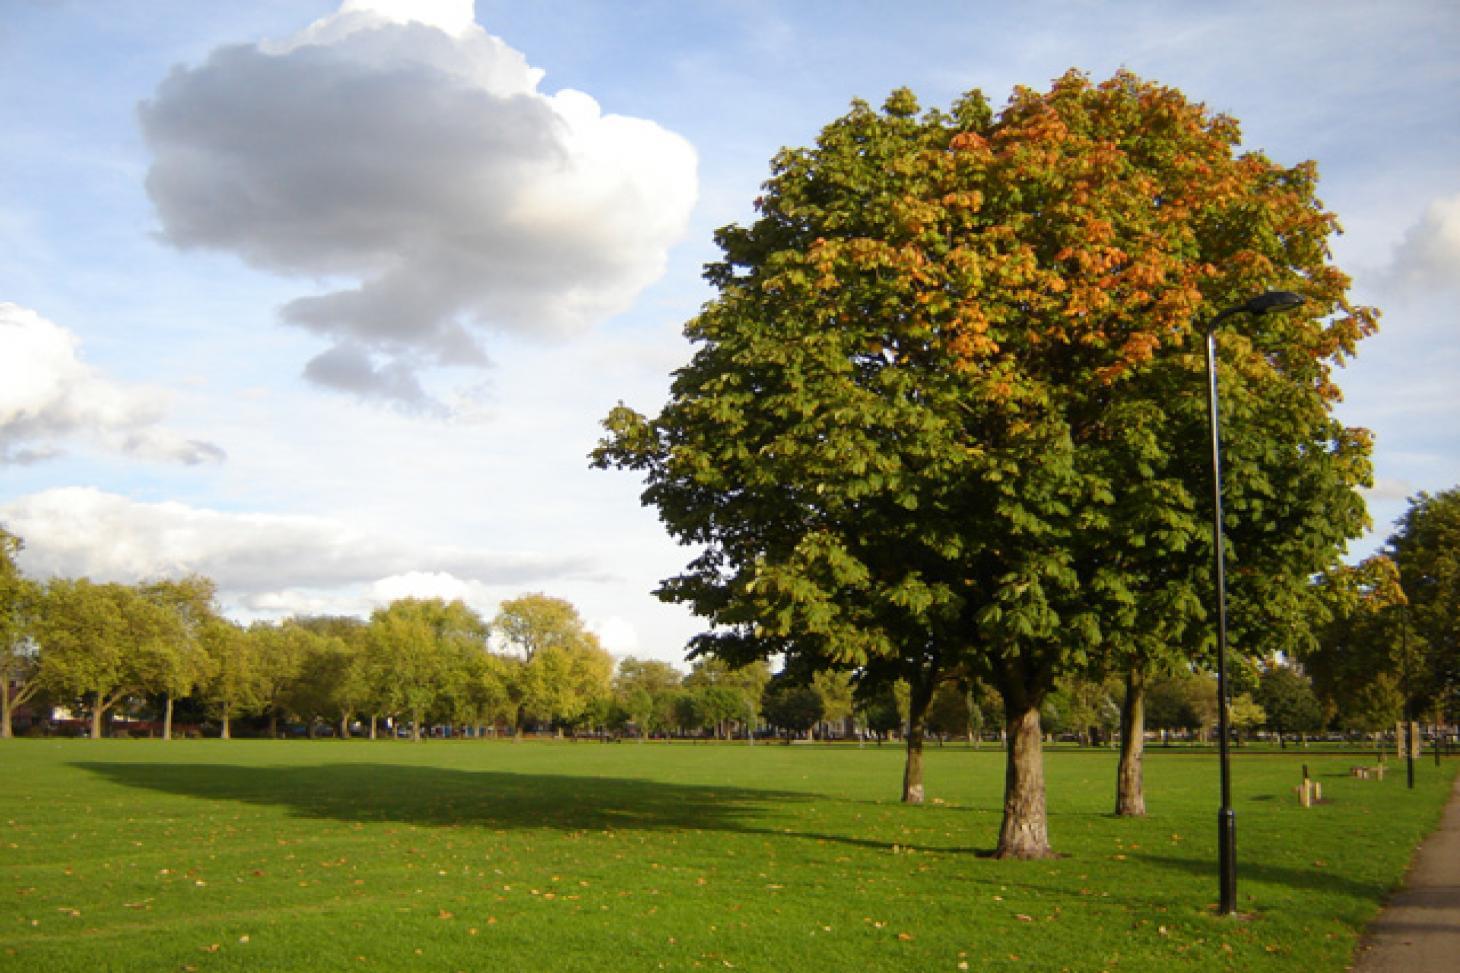 Hackney Downs Park Full size | Artificial cricket facilities